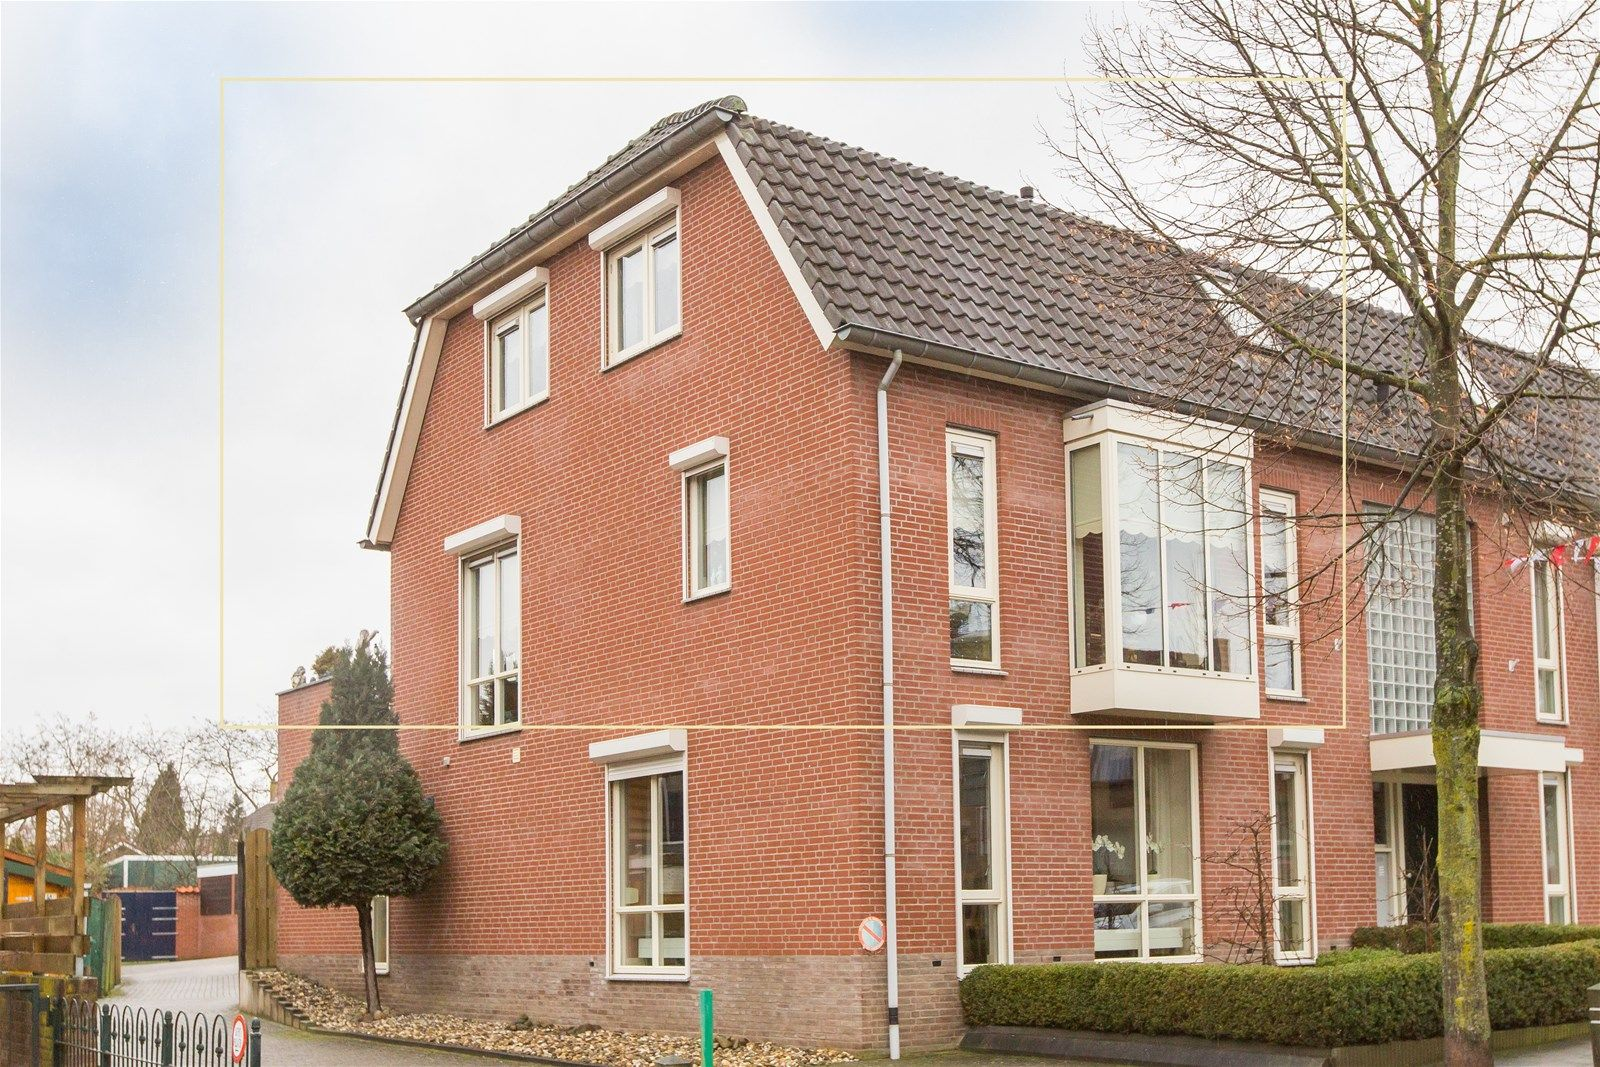 Zeddamseweg 45, 's-heerenberg